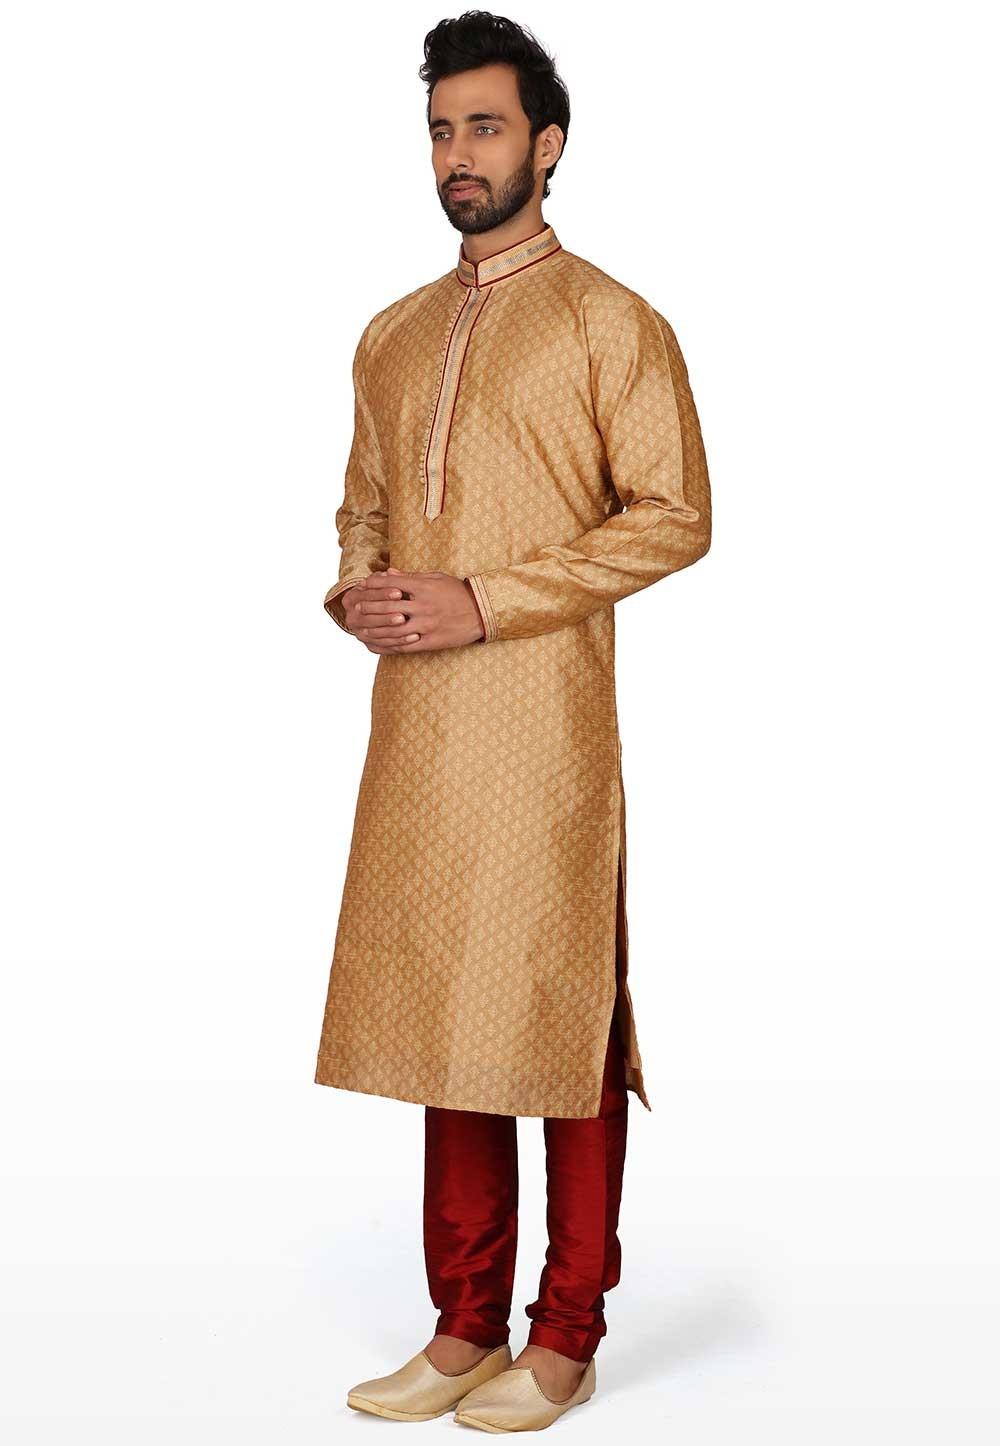 Golden Colour Men's Kurta Pajama.